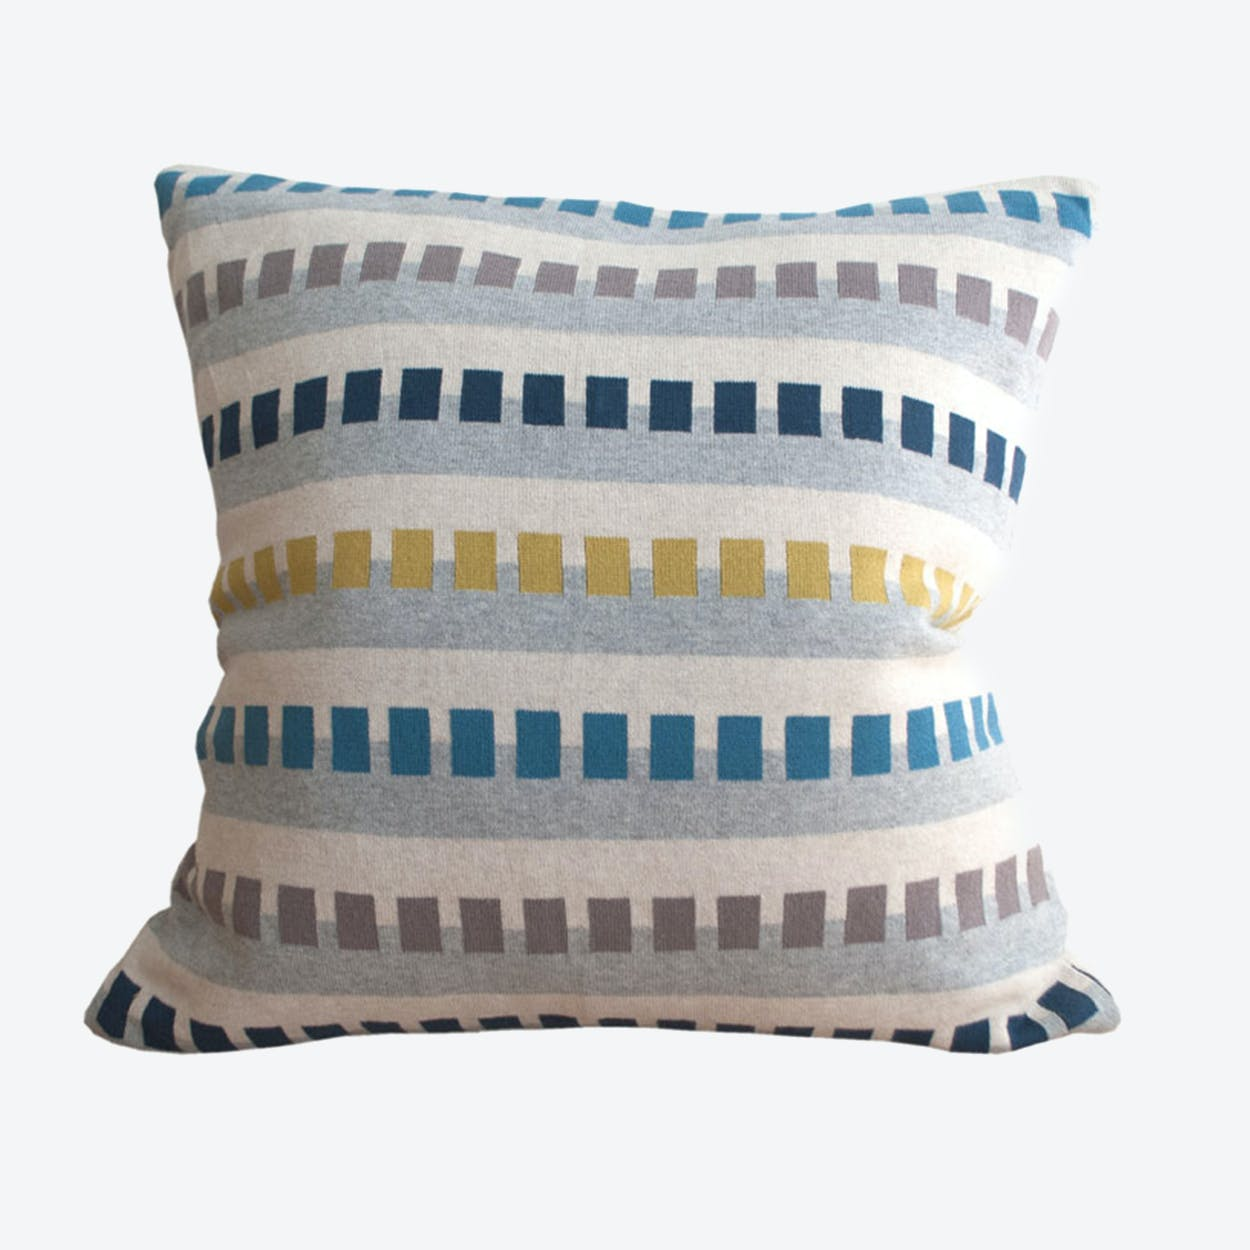 Birk Cushion Cover in Dark Blue